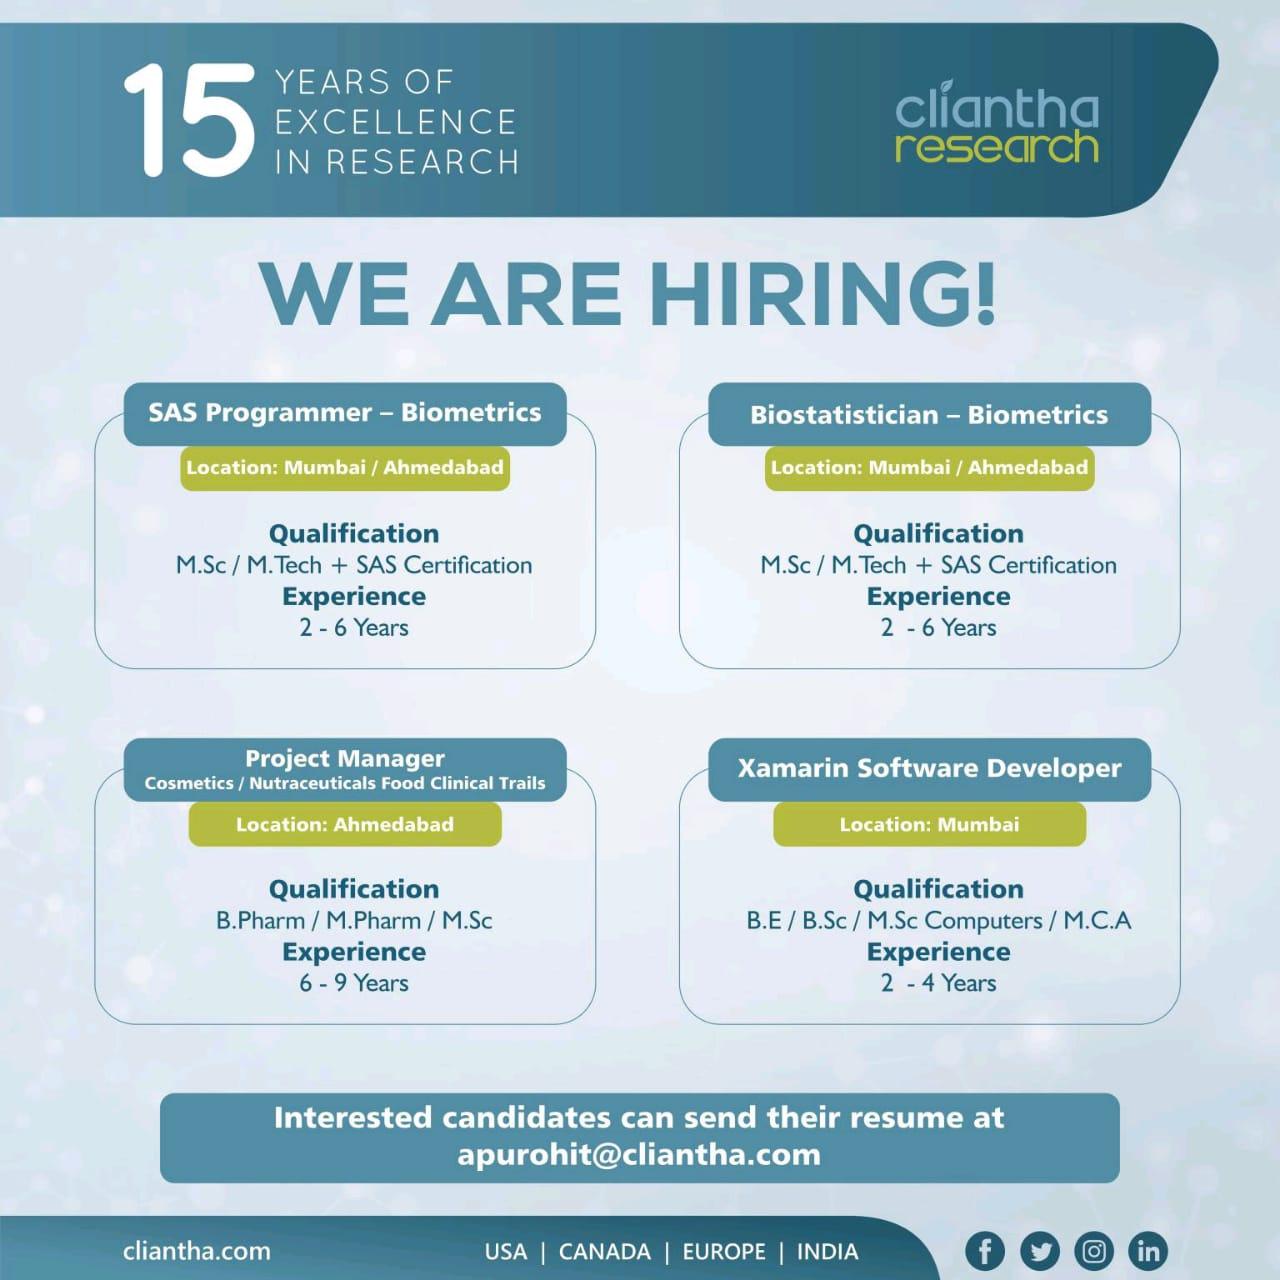 Cliantha Research Ltd – Job Opening for SAS Programmer, Biostatistician, Project Manager, Xamarin Software Developer | Apply Now